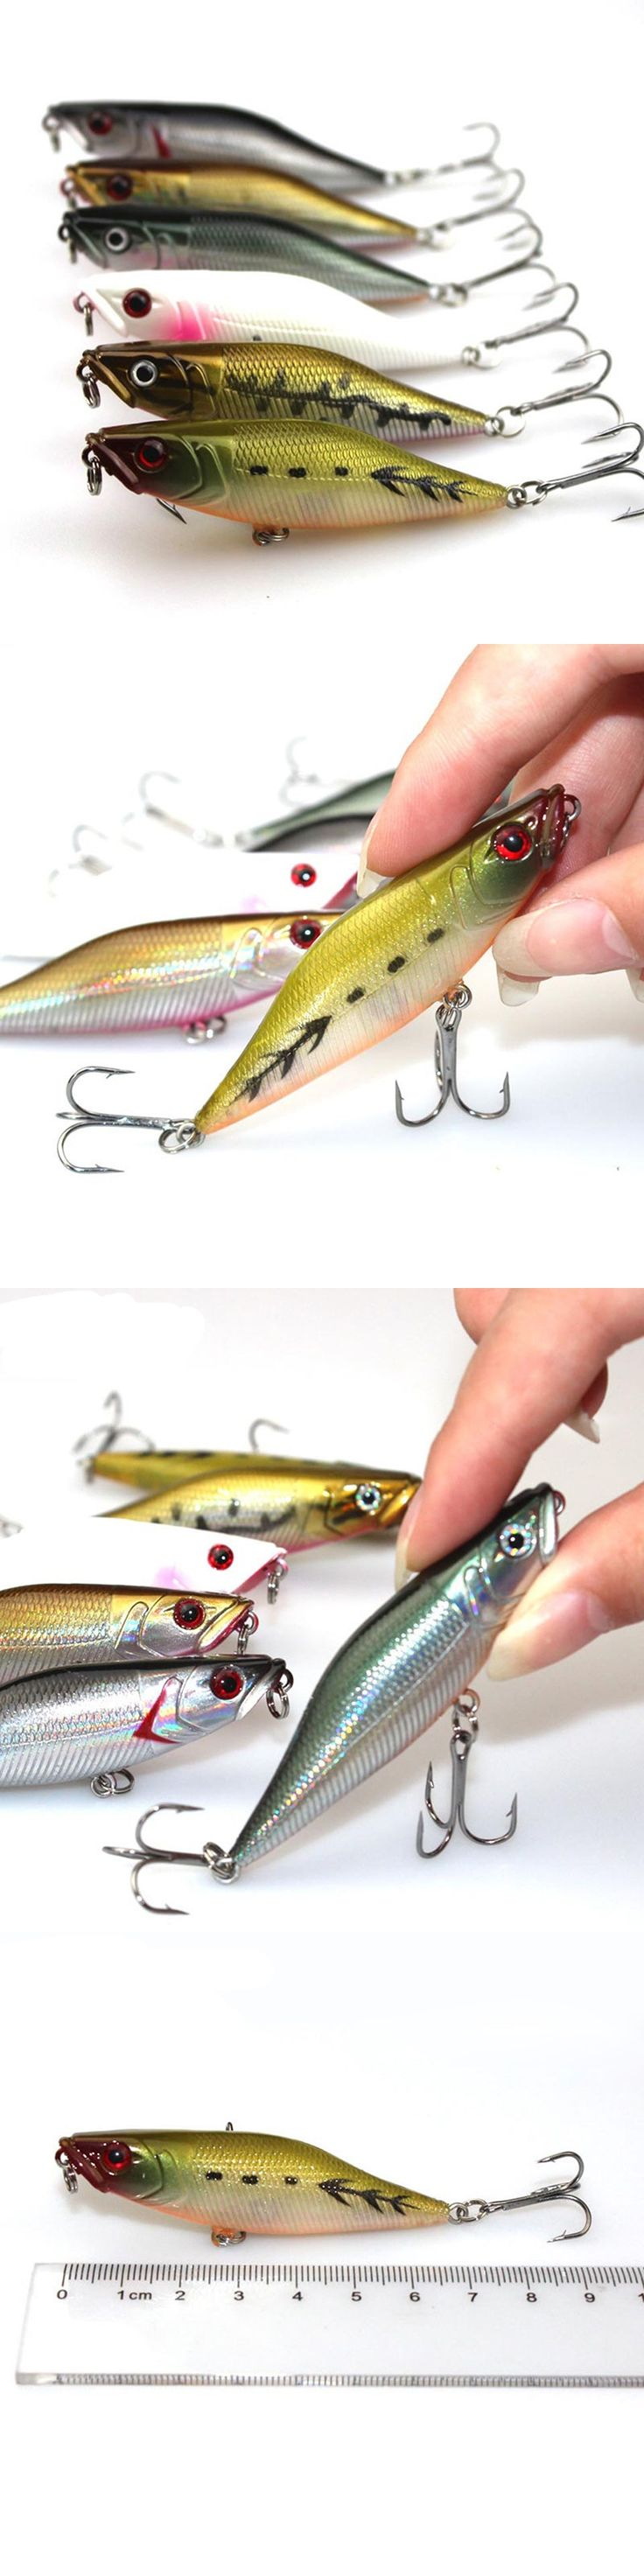 1PCS 7cm 7.2g Fishing Lure Fishing Tackle Wobbler Topwater Hard Bait Pencil Lure Carp Fishing Catfish Isca Artificial Bait PO001